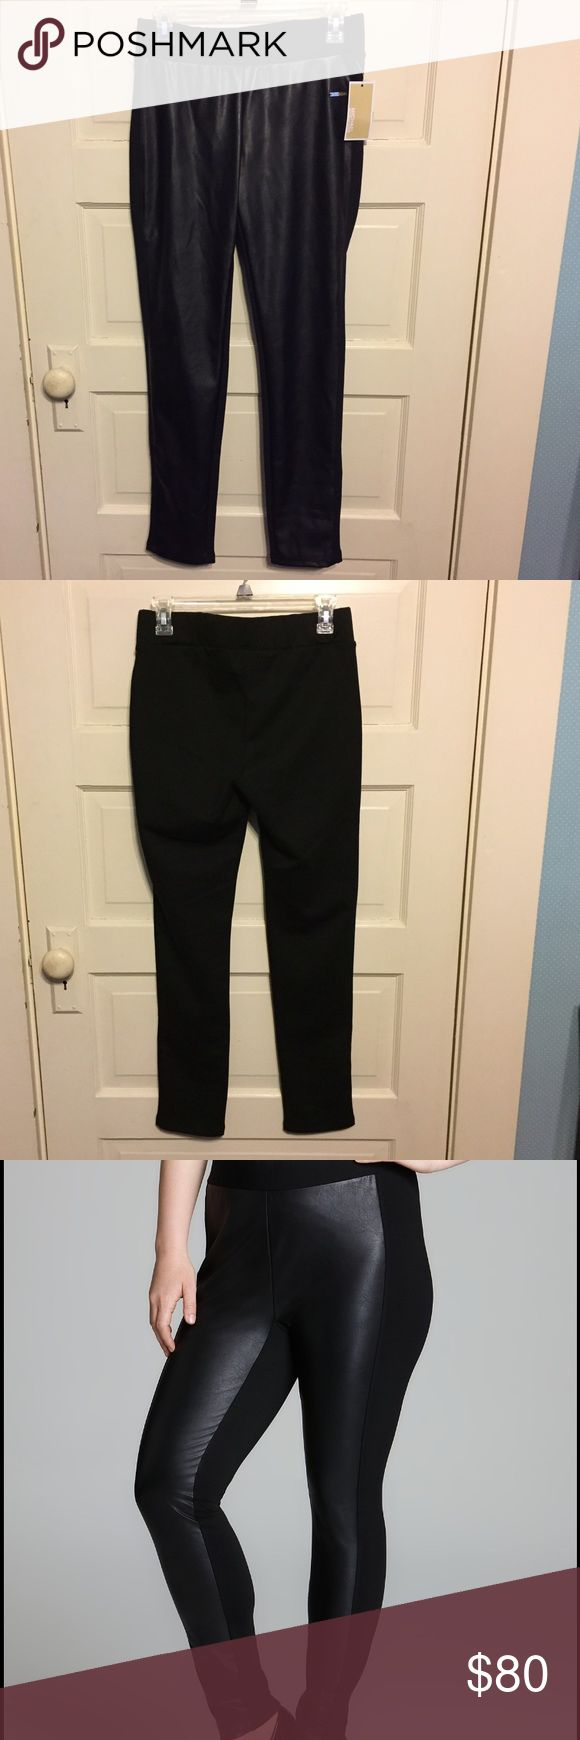 Michael Kors black faux leather front leggings Michael Kors size small black faux leather front leggings.  These leggings bring a pop to every outfit!  NWT. Michael Kors Pants Leggings